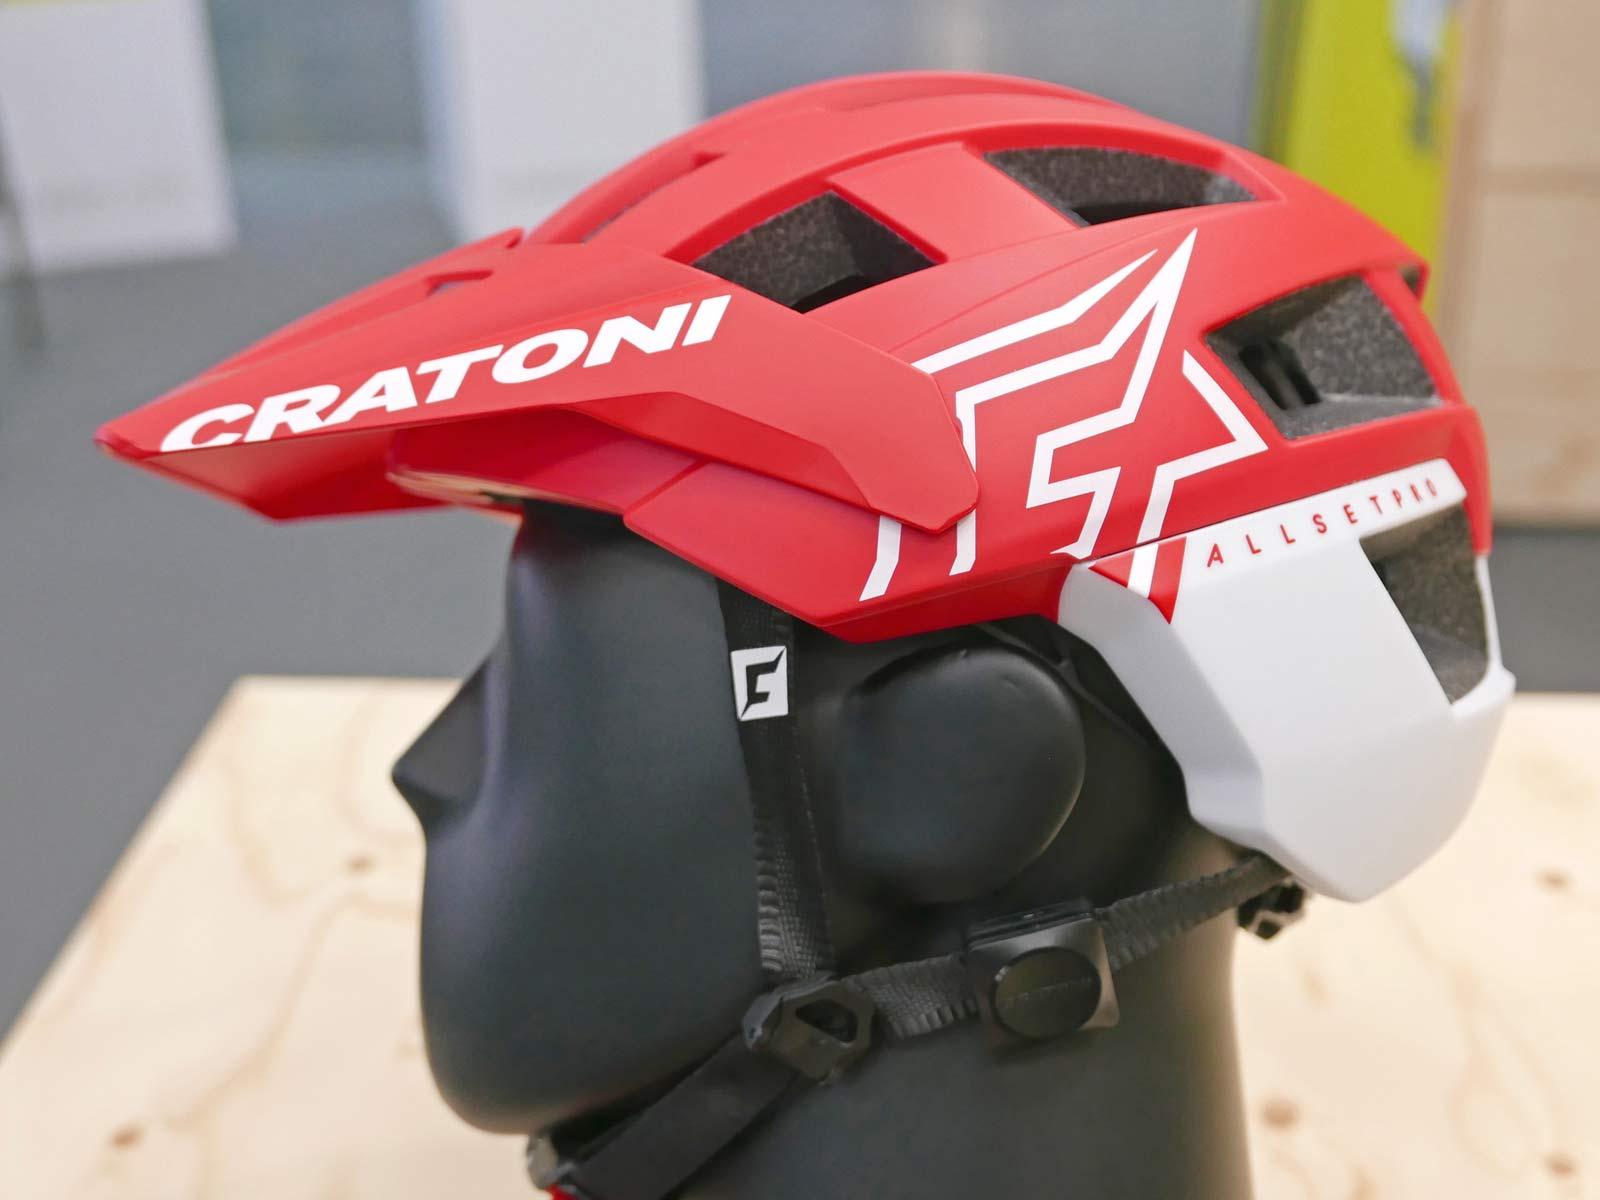 Cratoni C-Safe crash sensor, add-on impact detection safety upgrade for any helmet,on Allset Pro